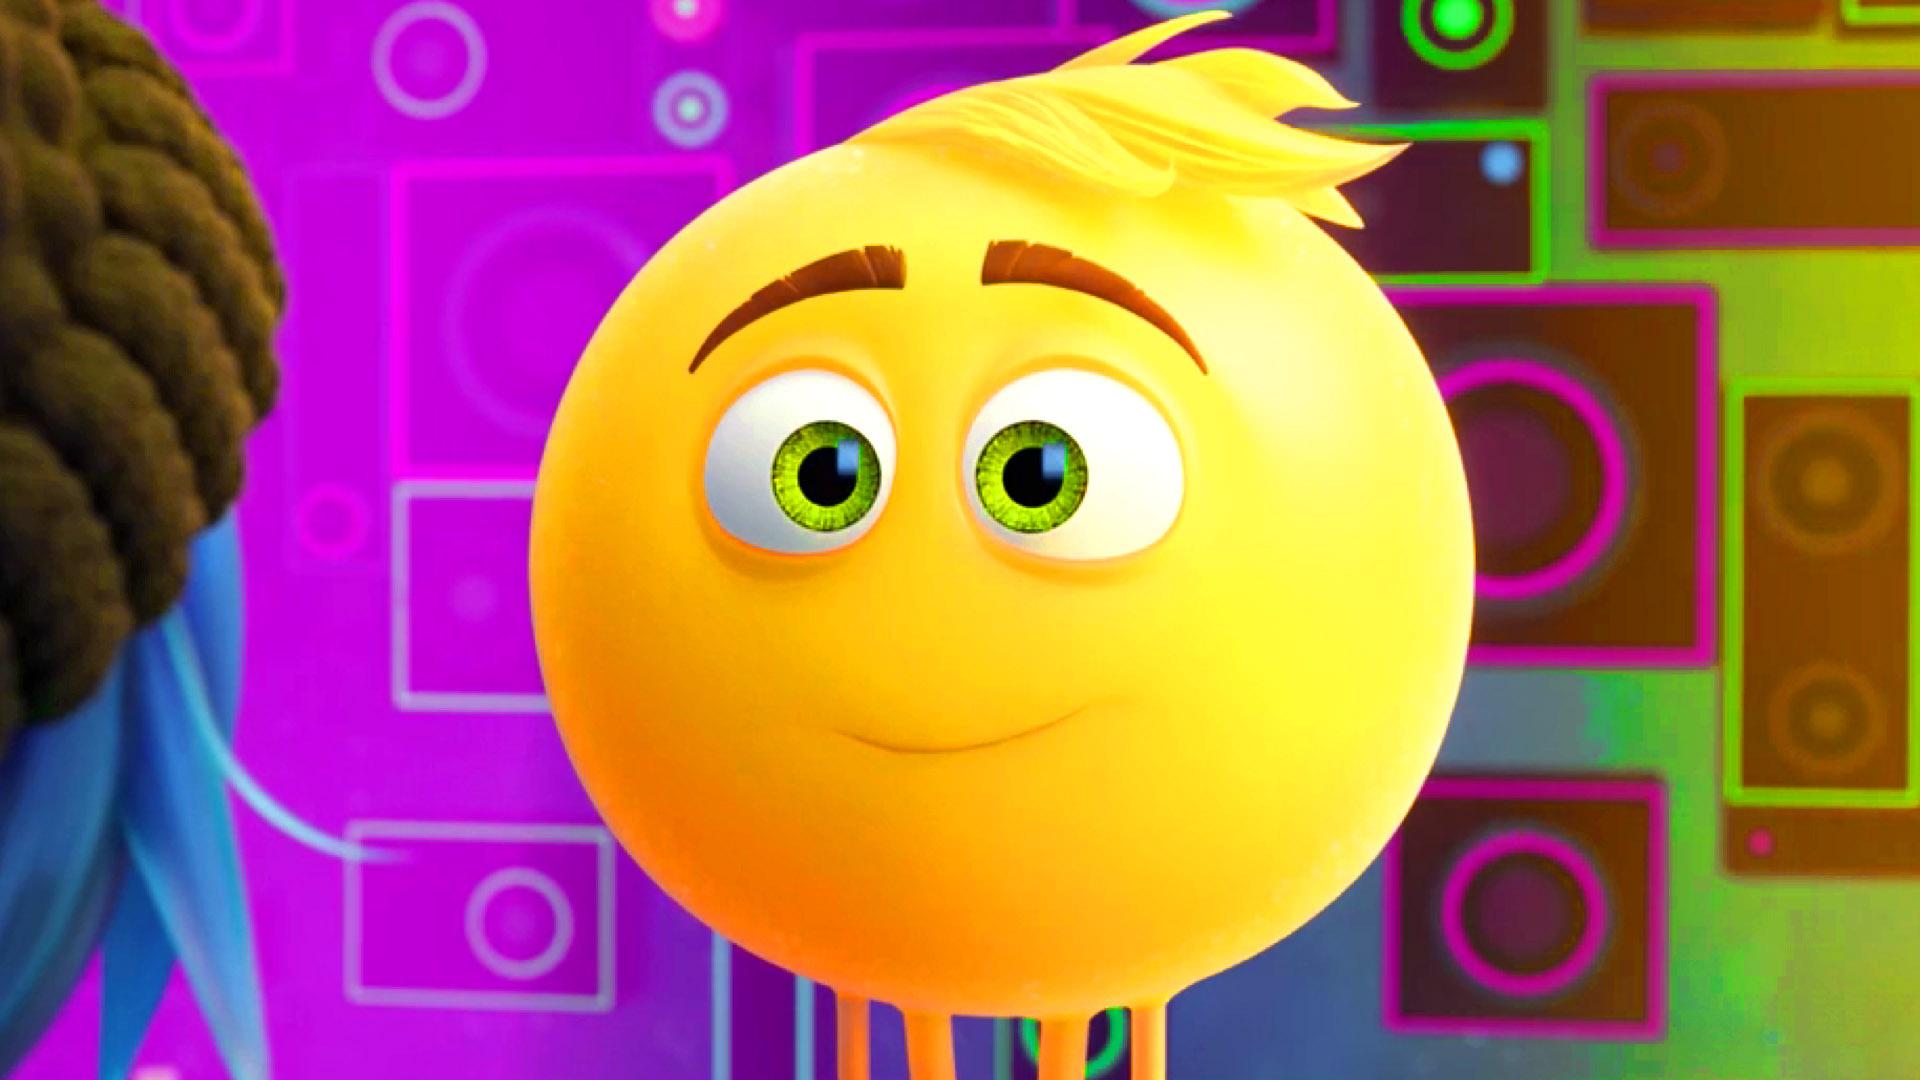 1920x1080px The Emoji Movie Wallpapers - WallpaperSafari